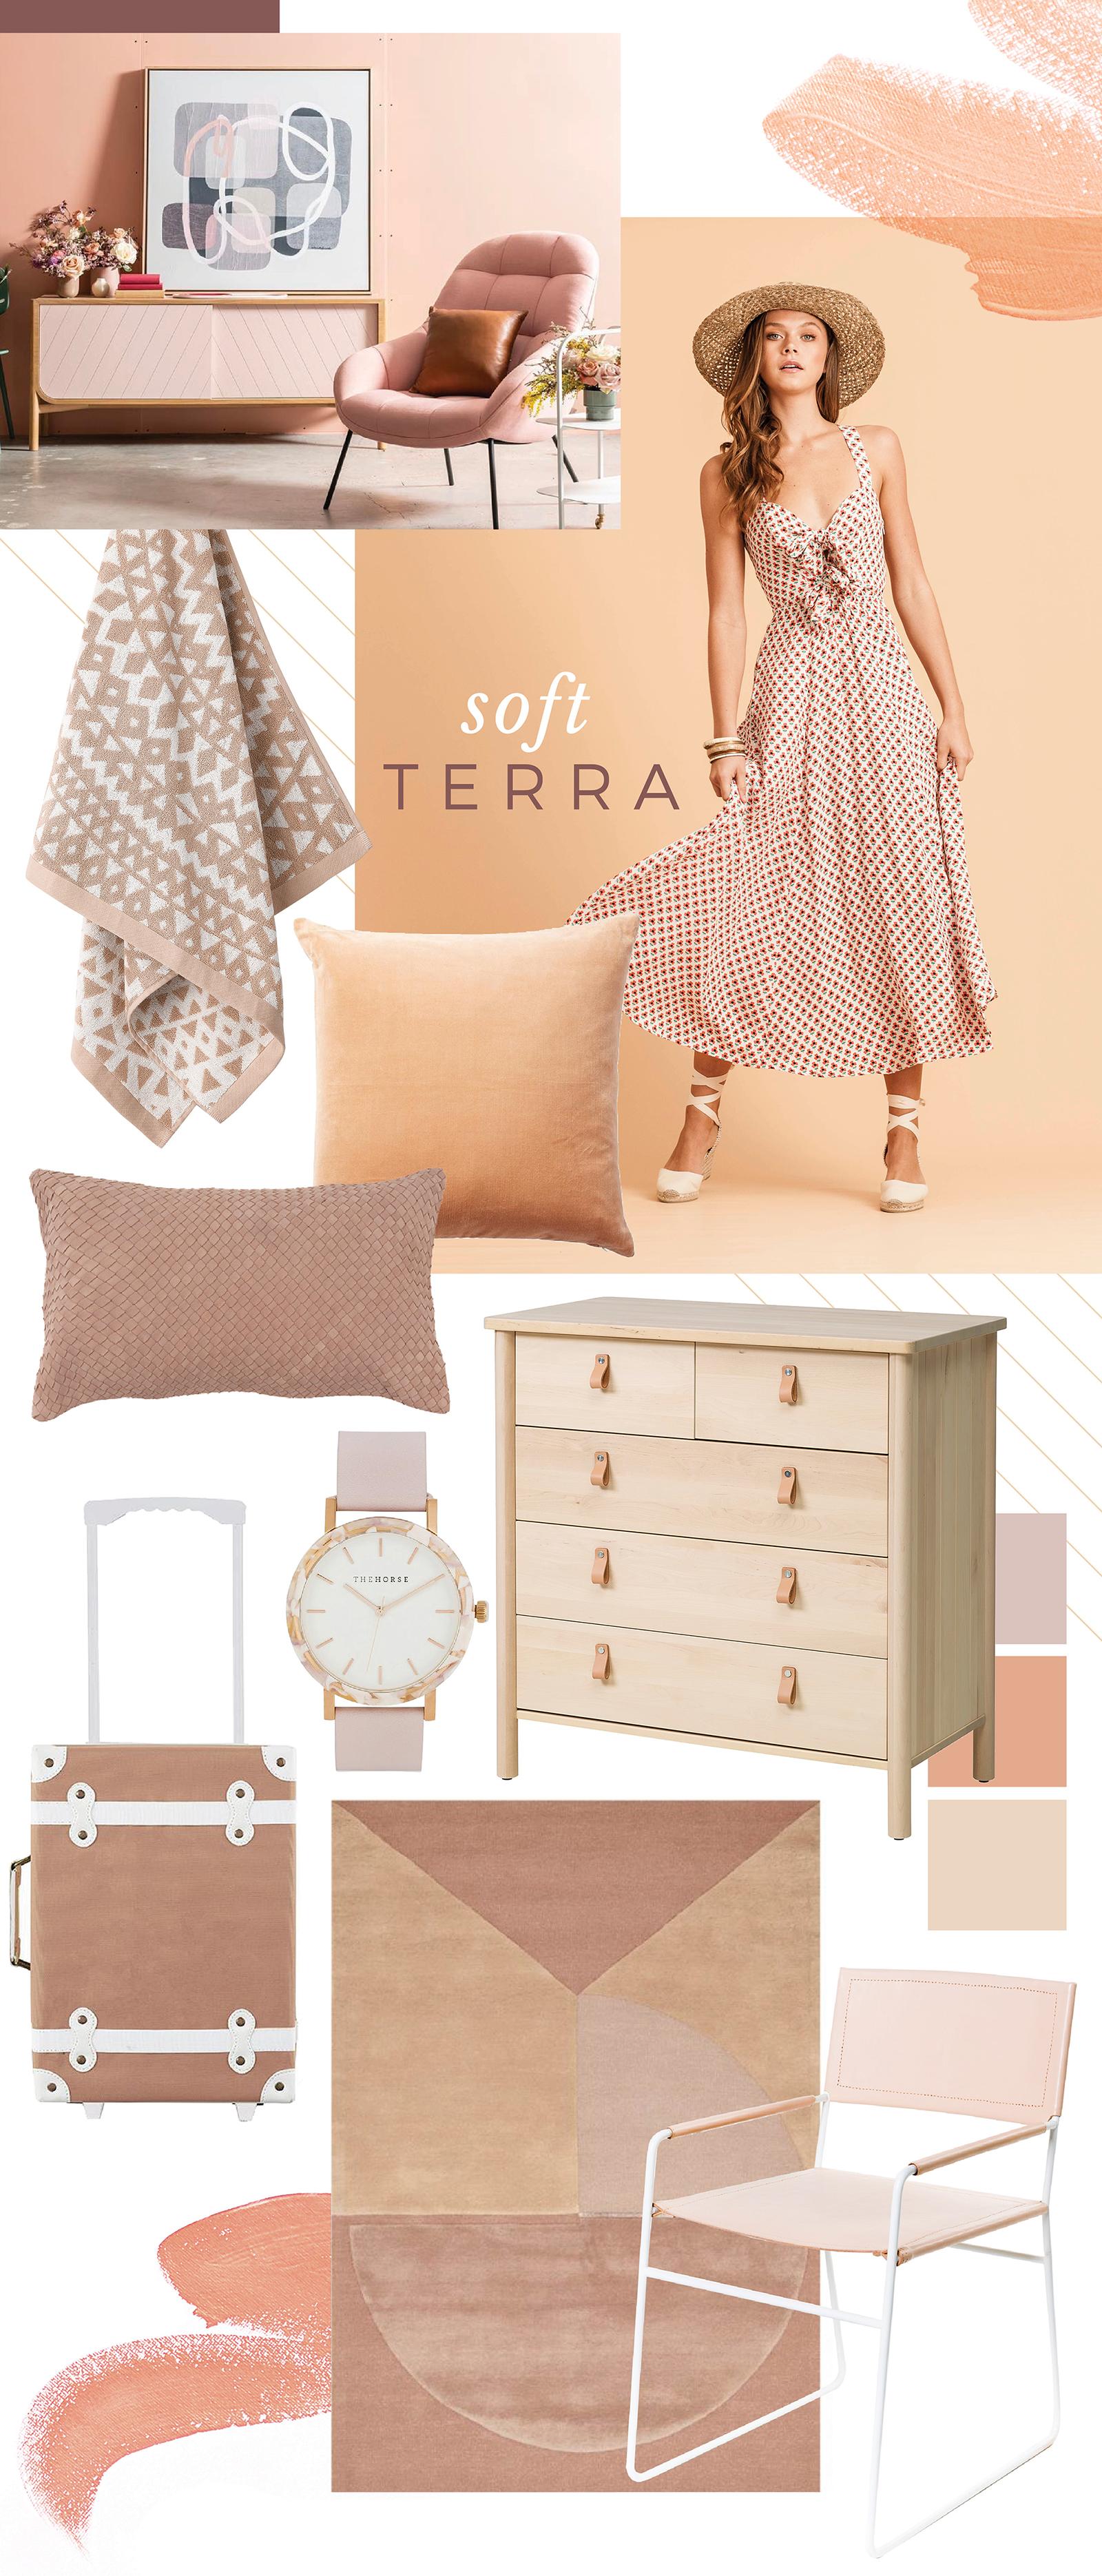 adore_home_blog_colour_trend_soft_terra_terracotta-blush_pink.jpg